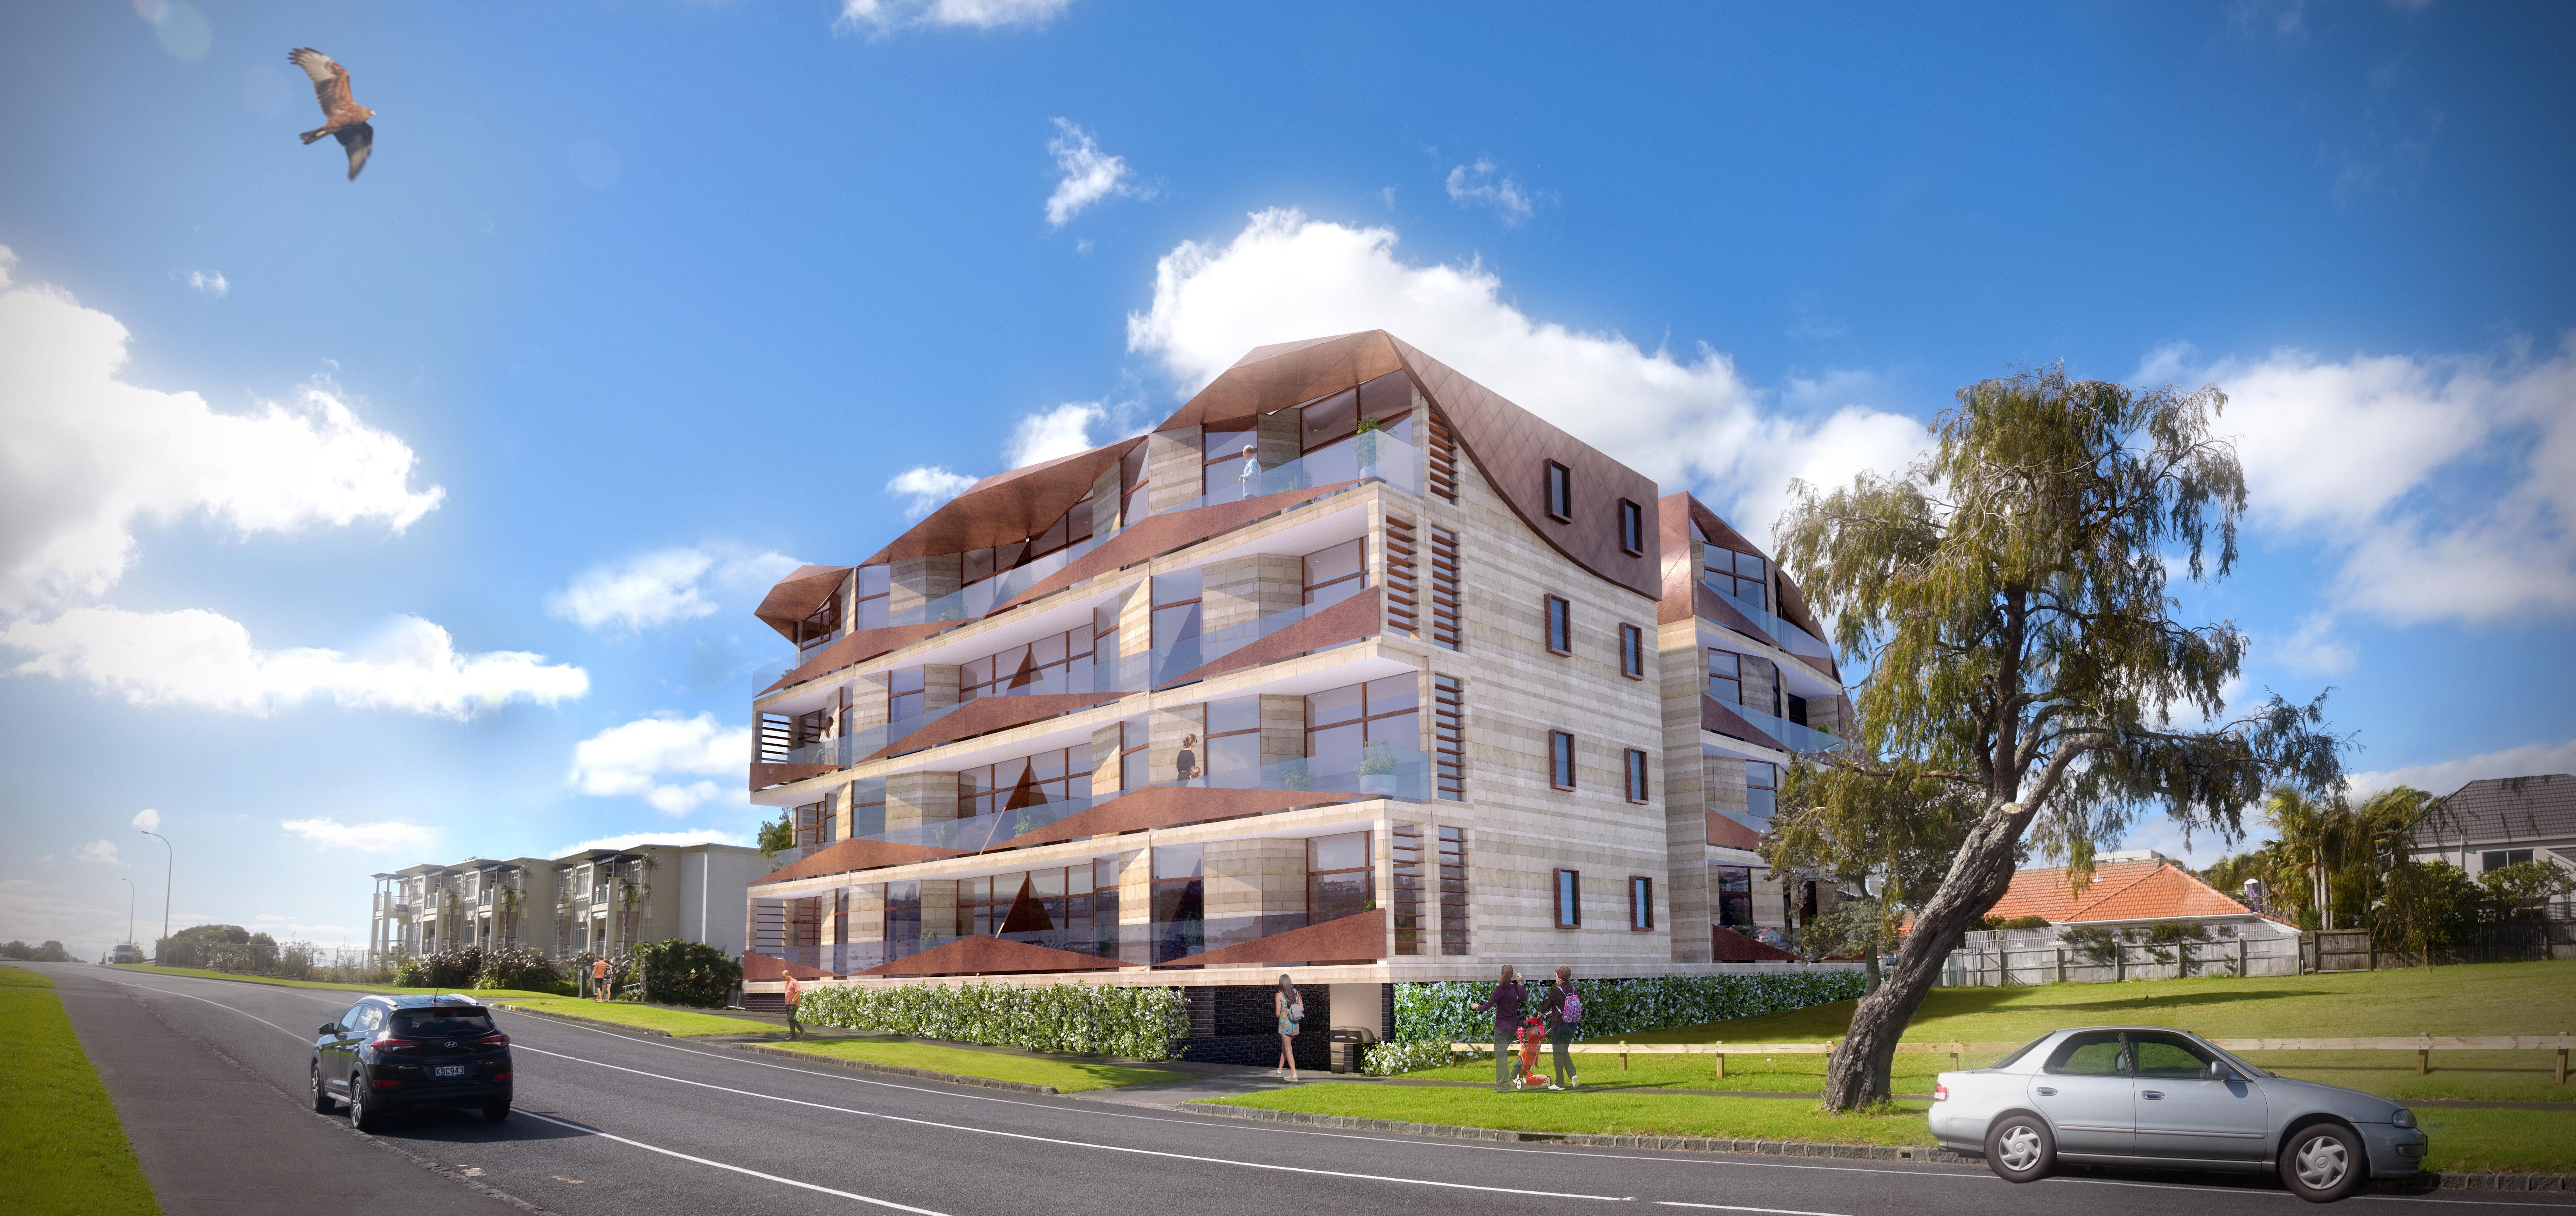 Klein_Kahu_Apartments_Render1